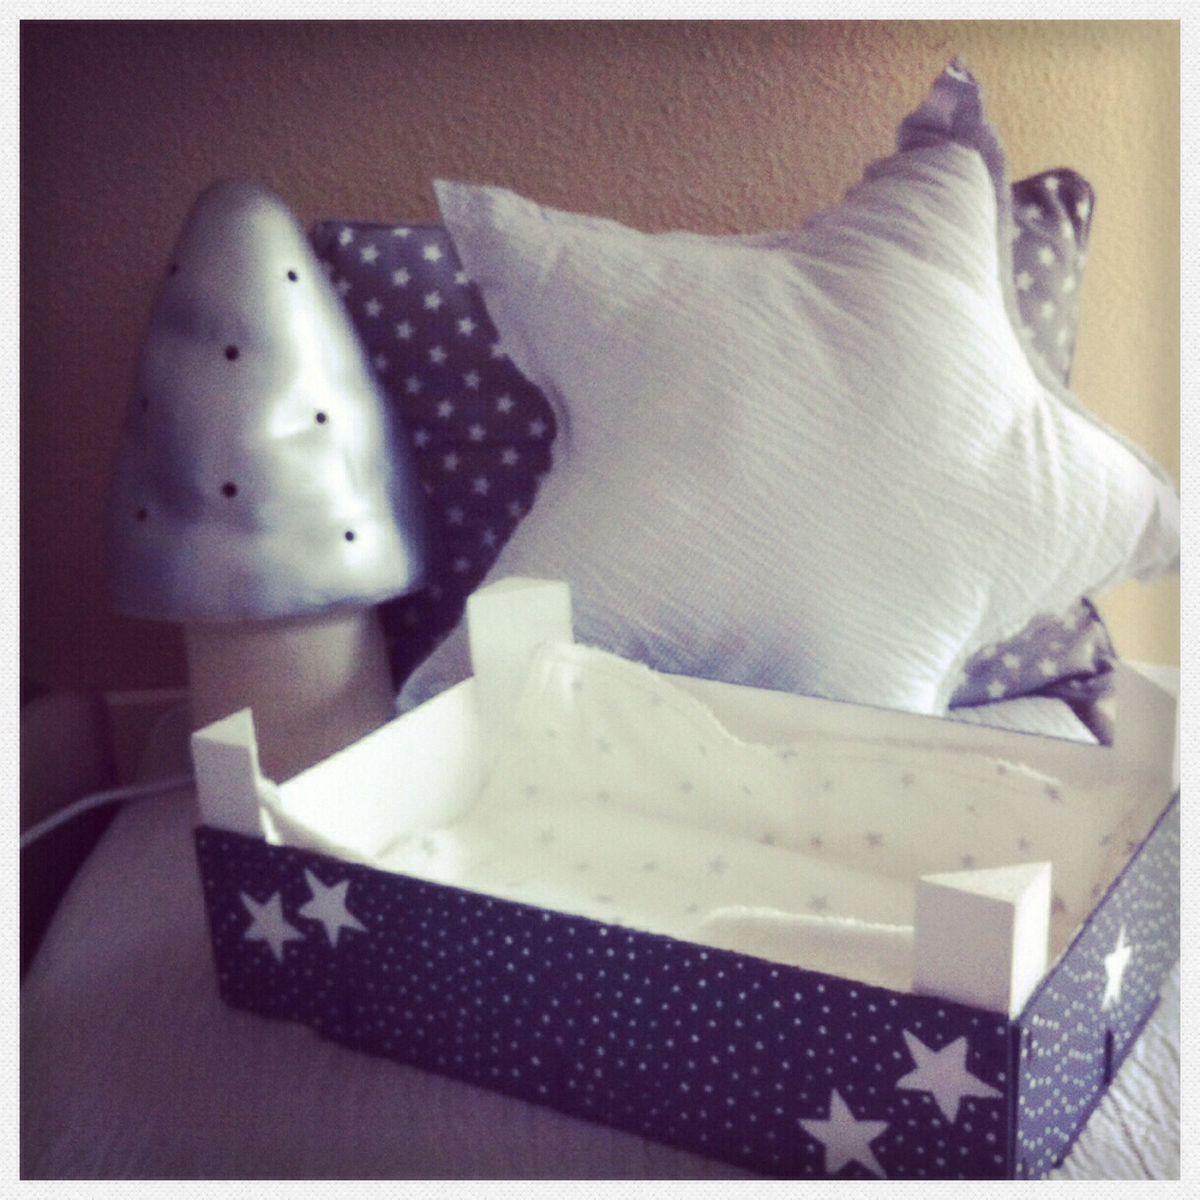 1000 images about cajas de frutas decorada on pinterest - Cajas decoradas para bebes ...